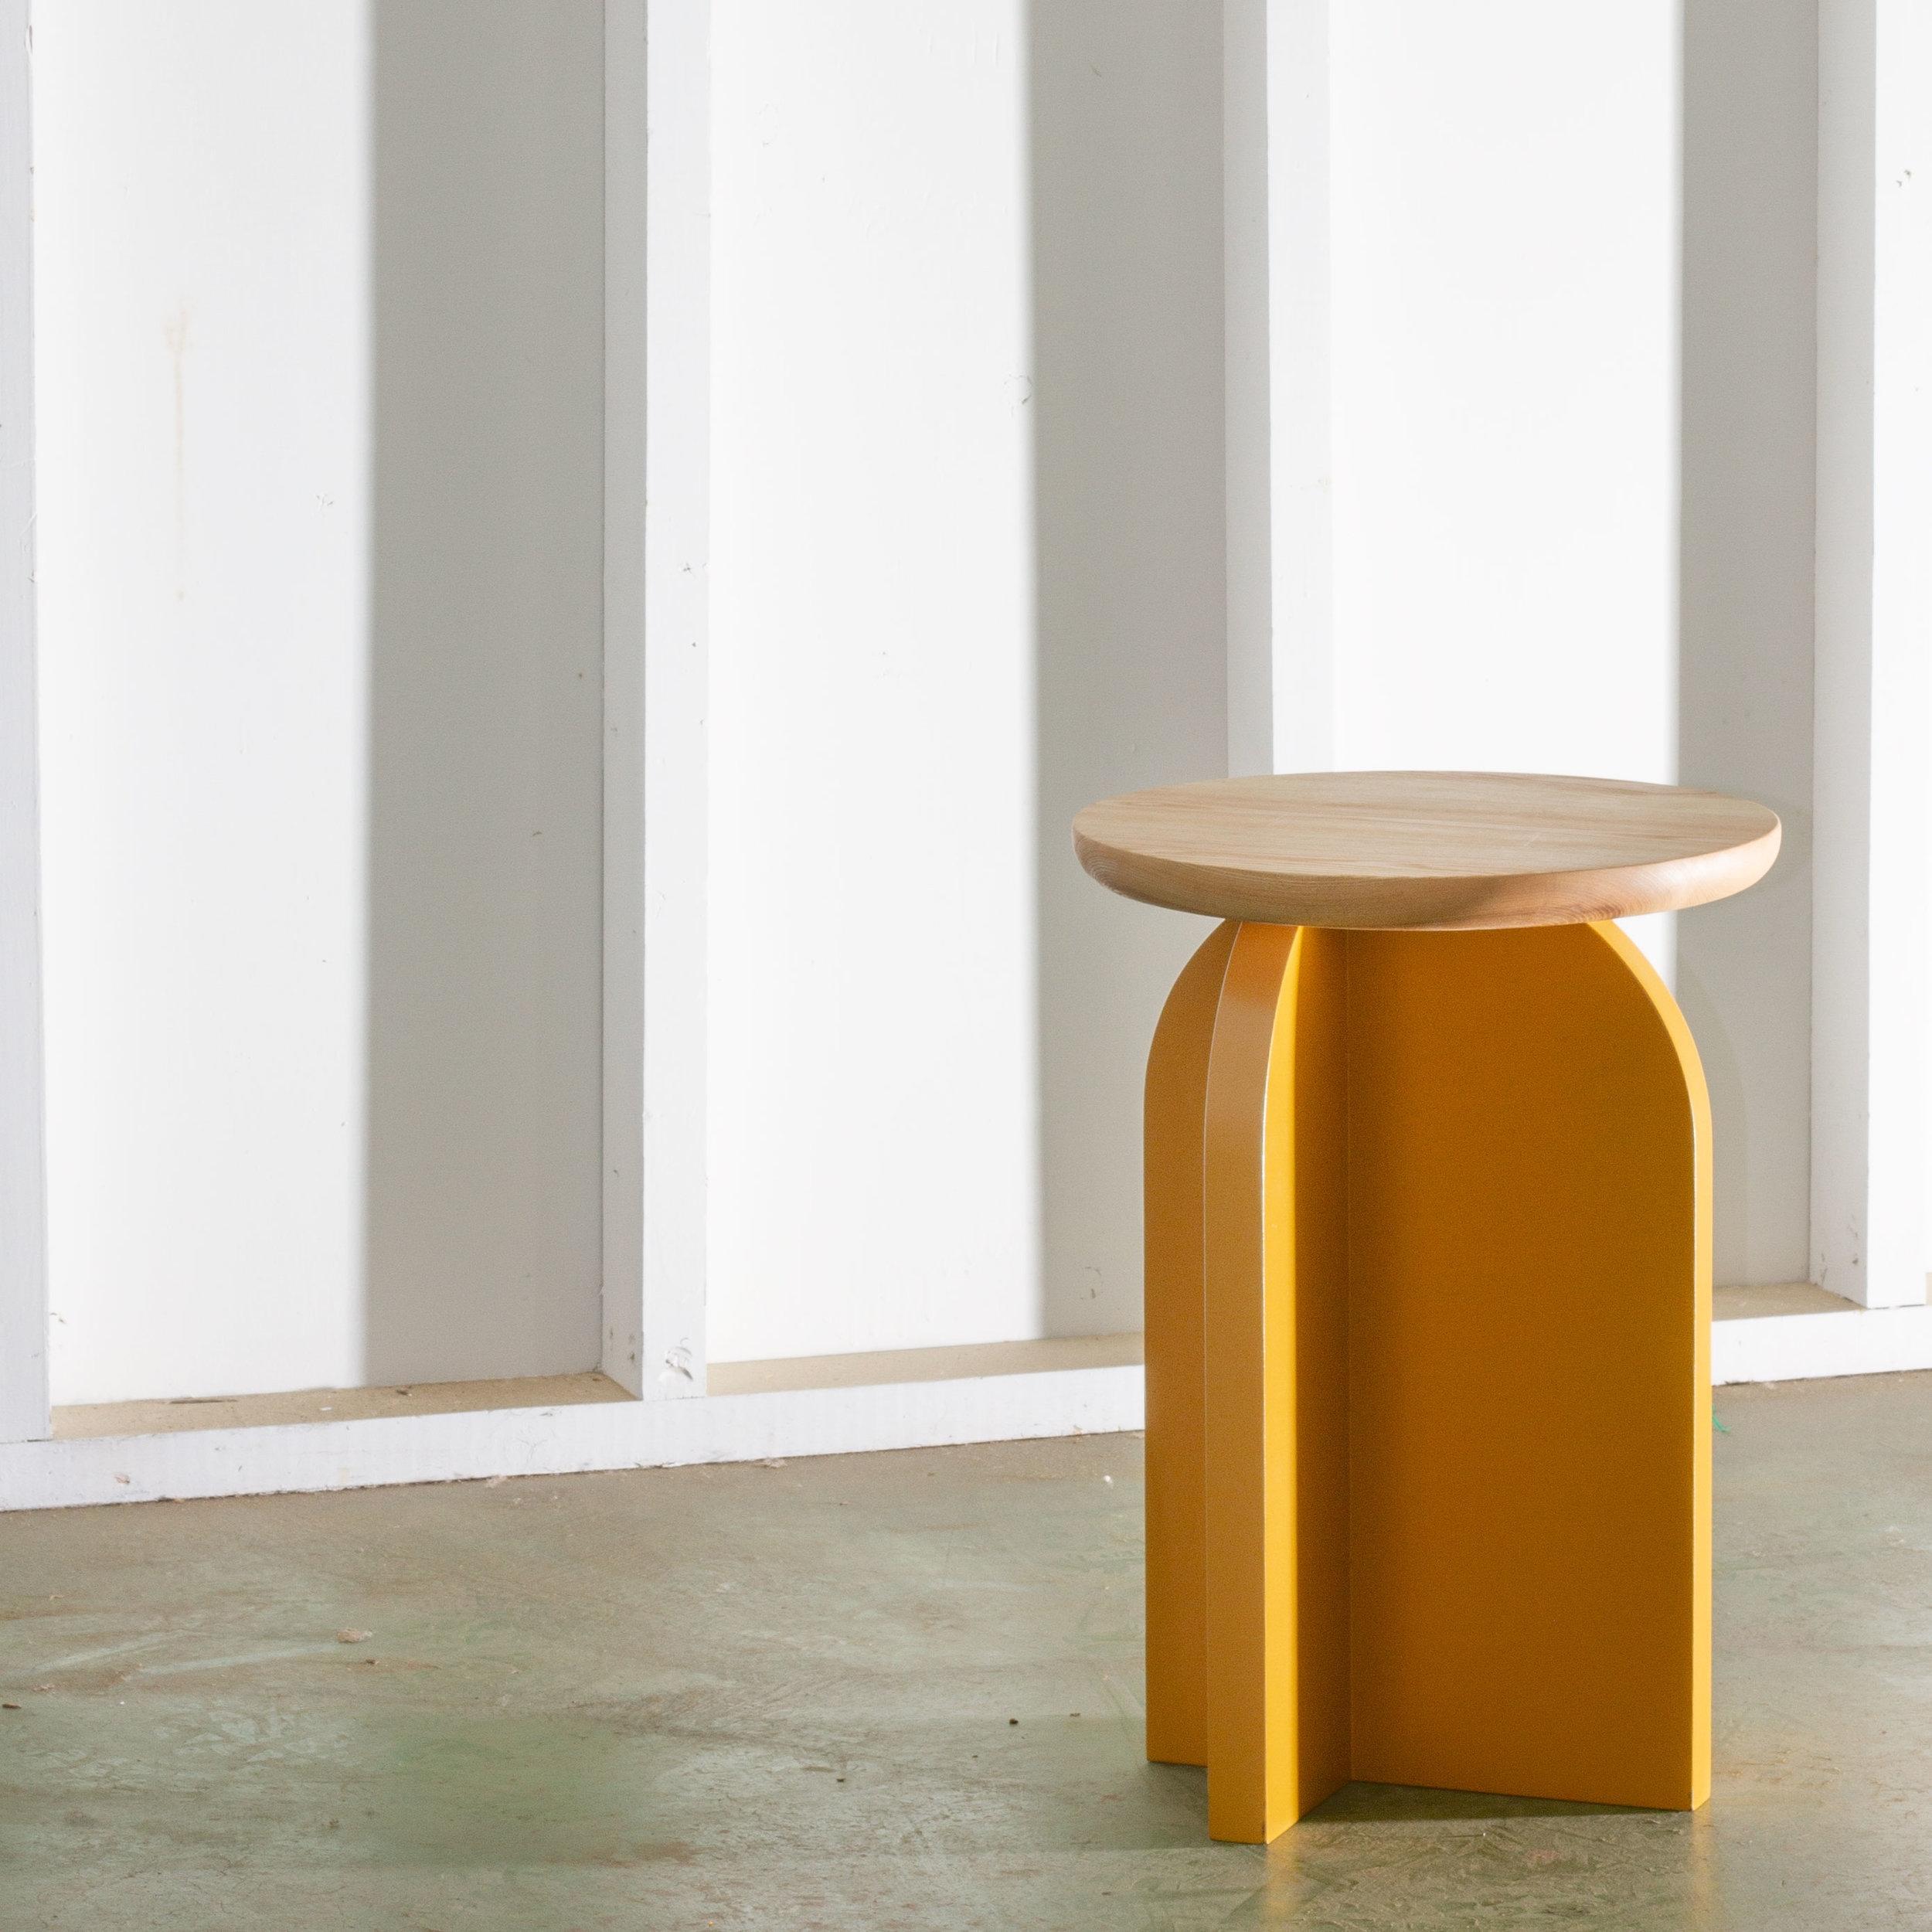 CLOVERDALE SIDE TABLE